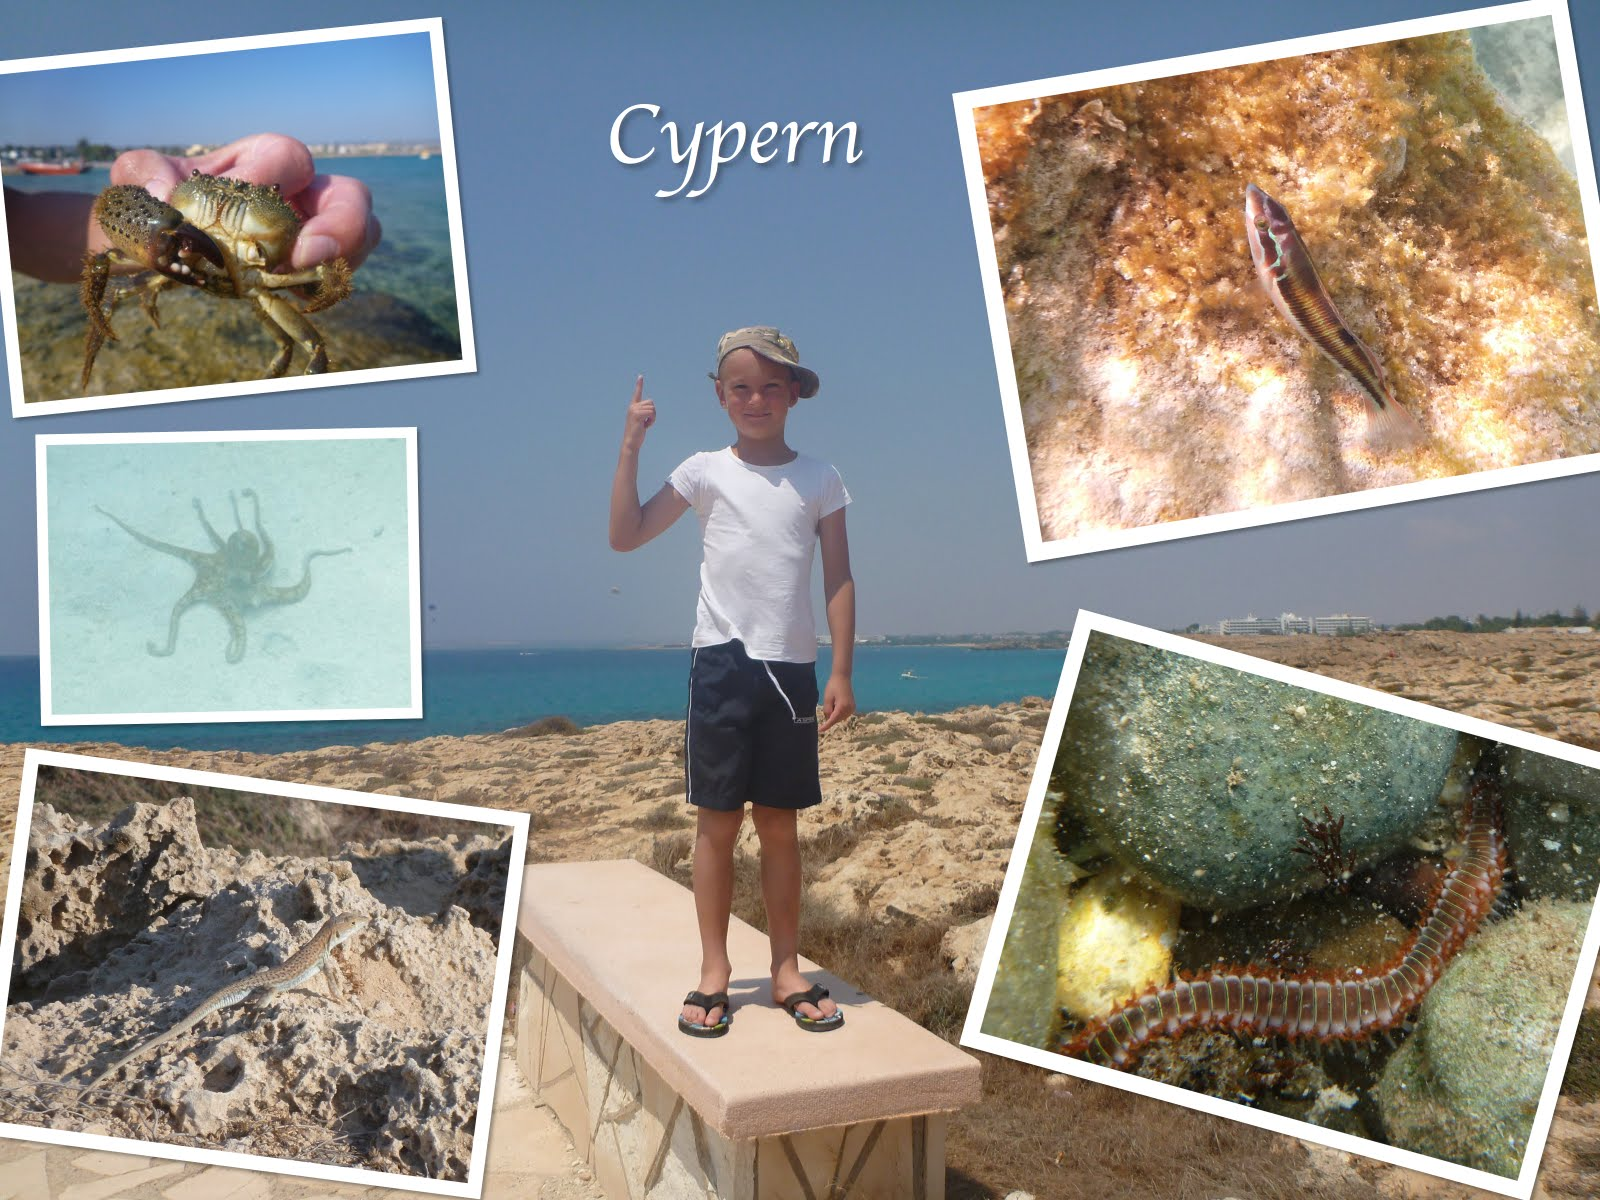 resa till cypern ud